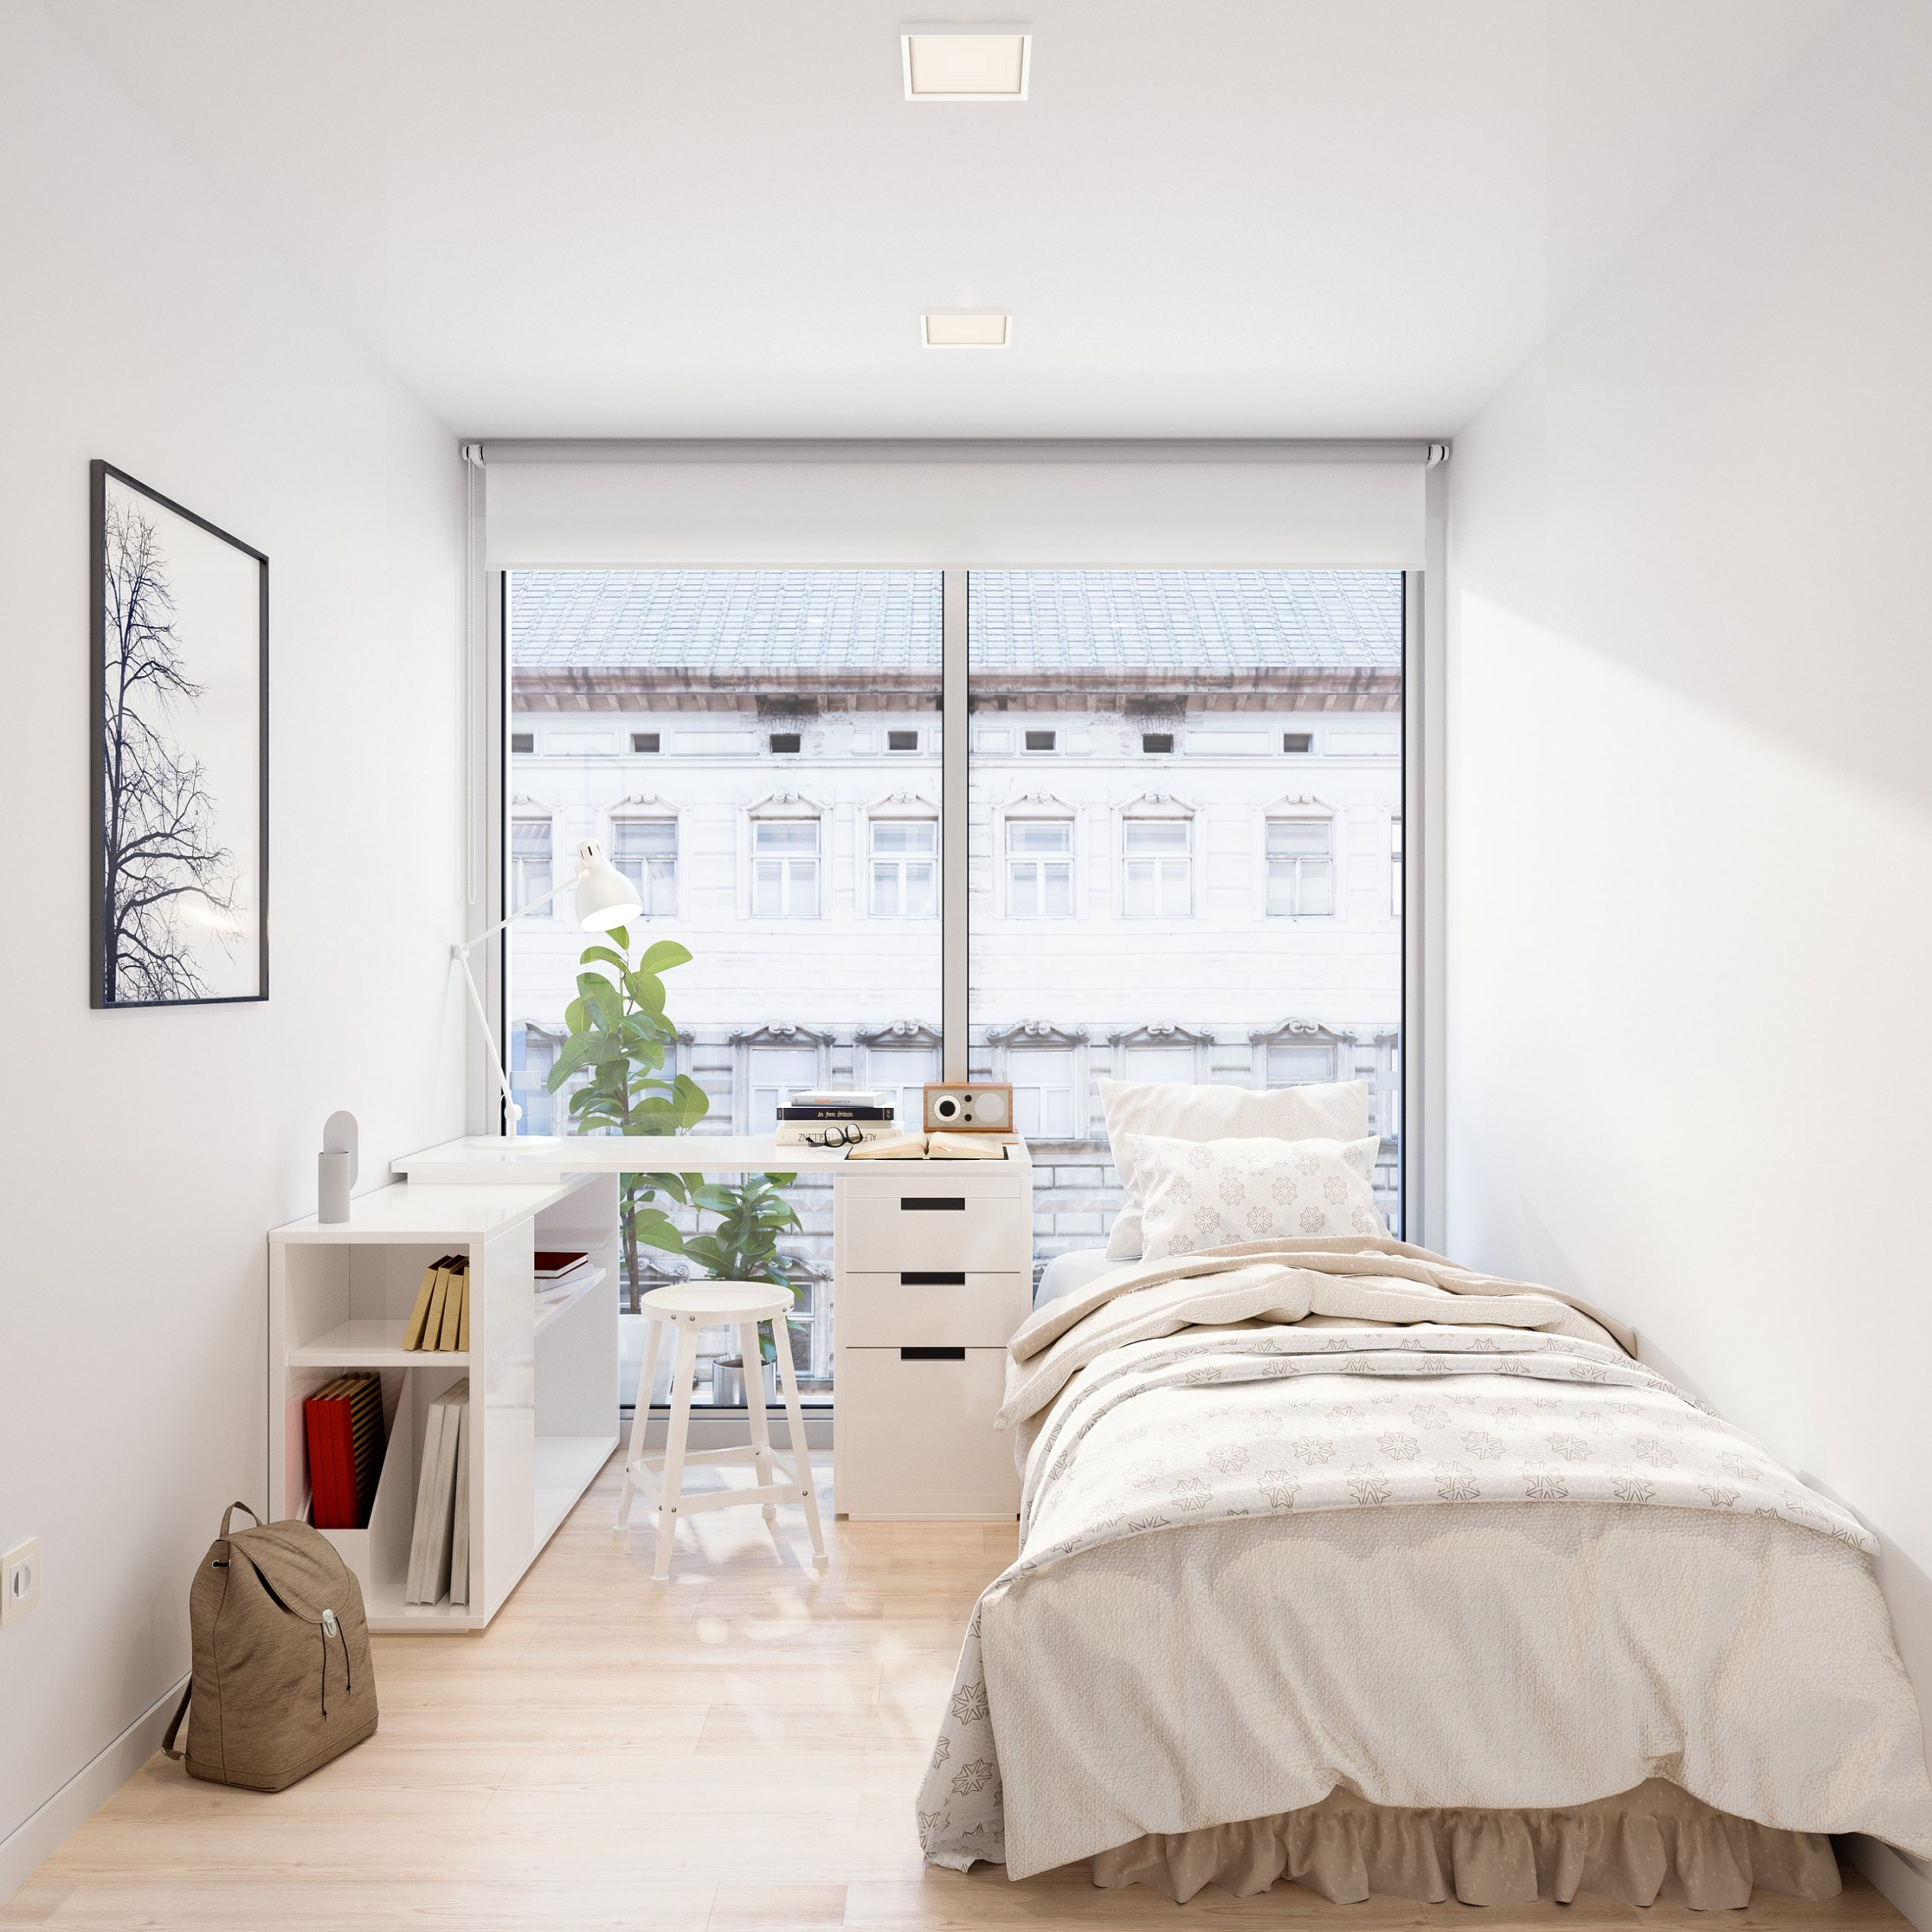 17 WR10 Dormitorio 2 Tip B